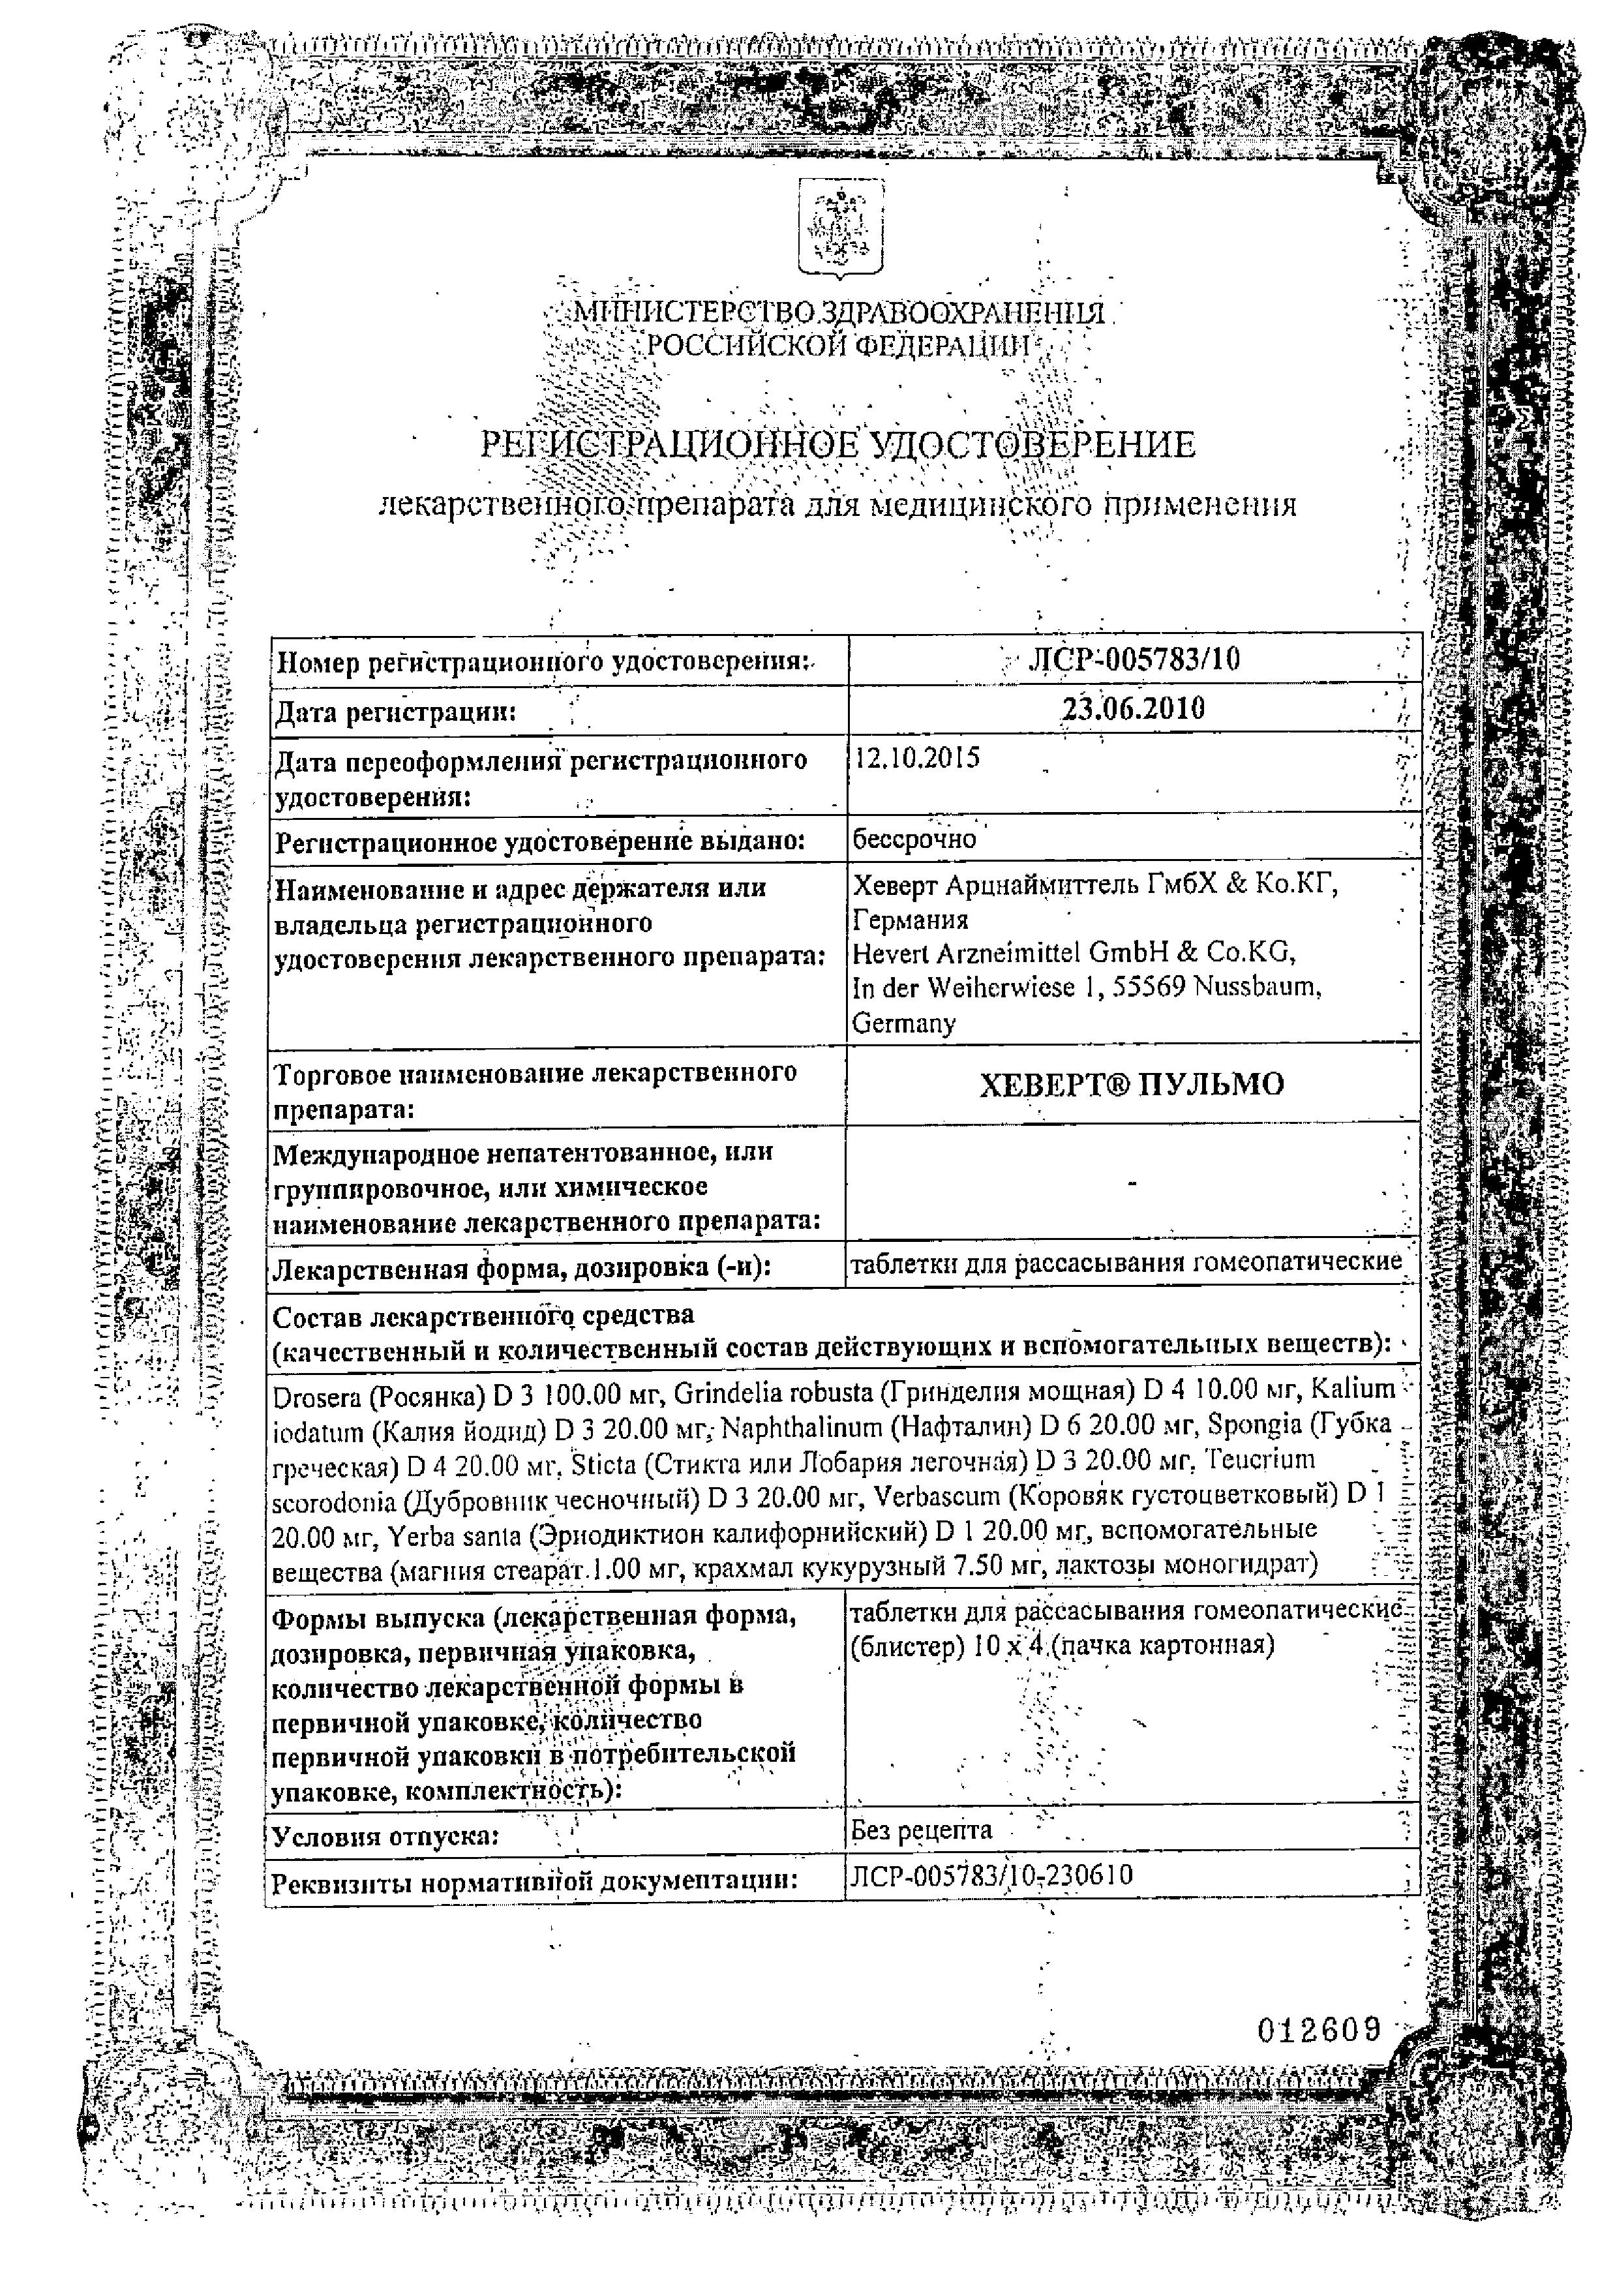 Хеверт пульмо сертификат